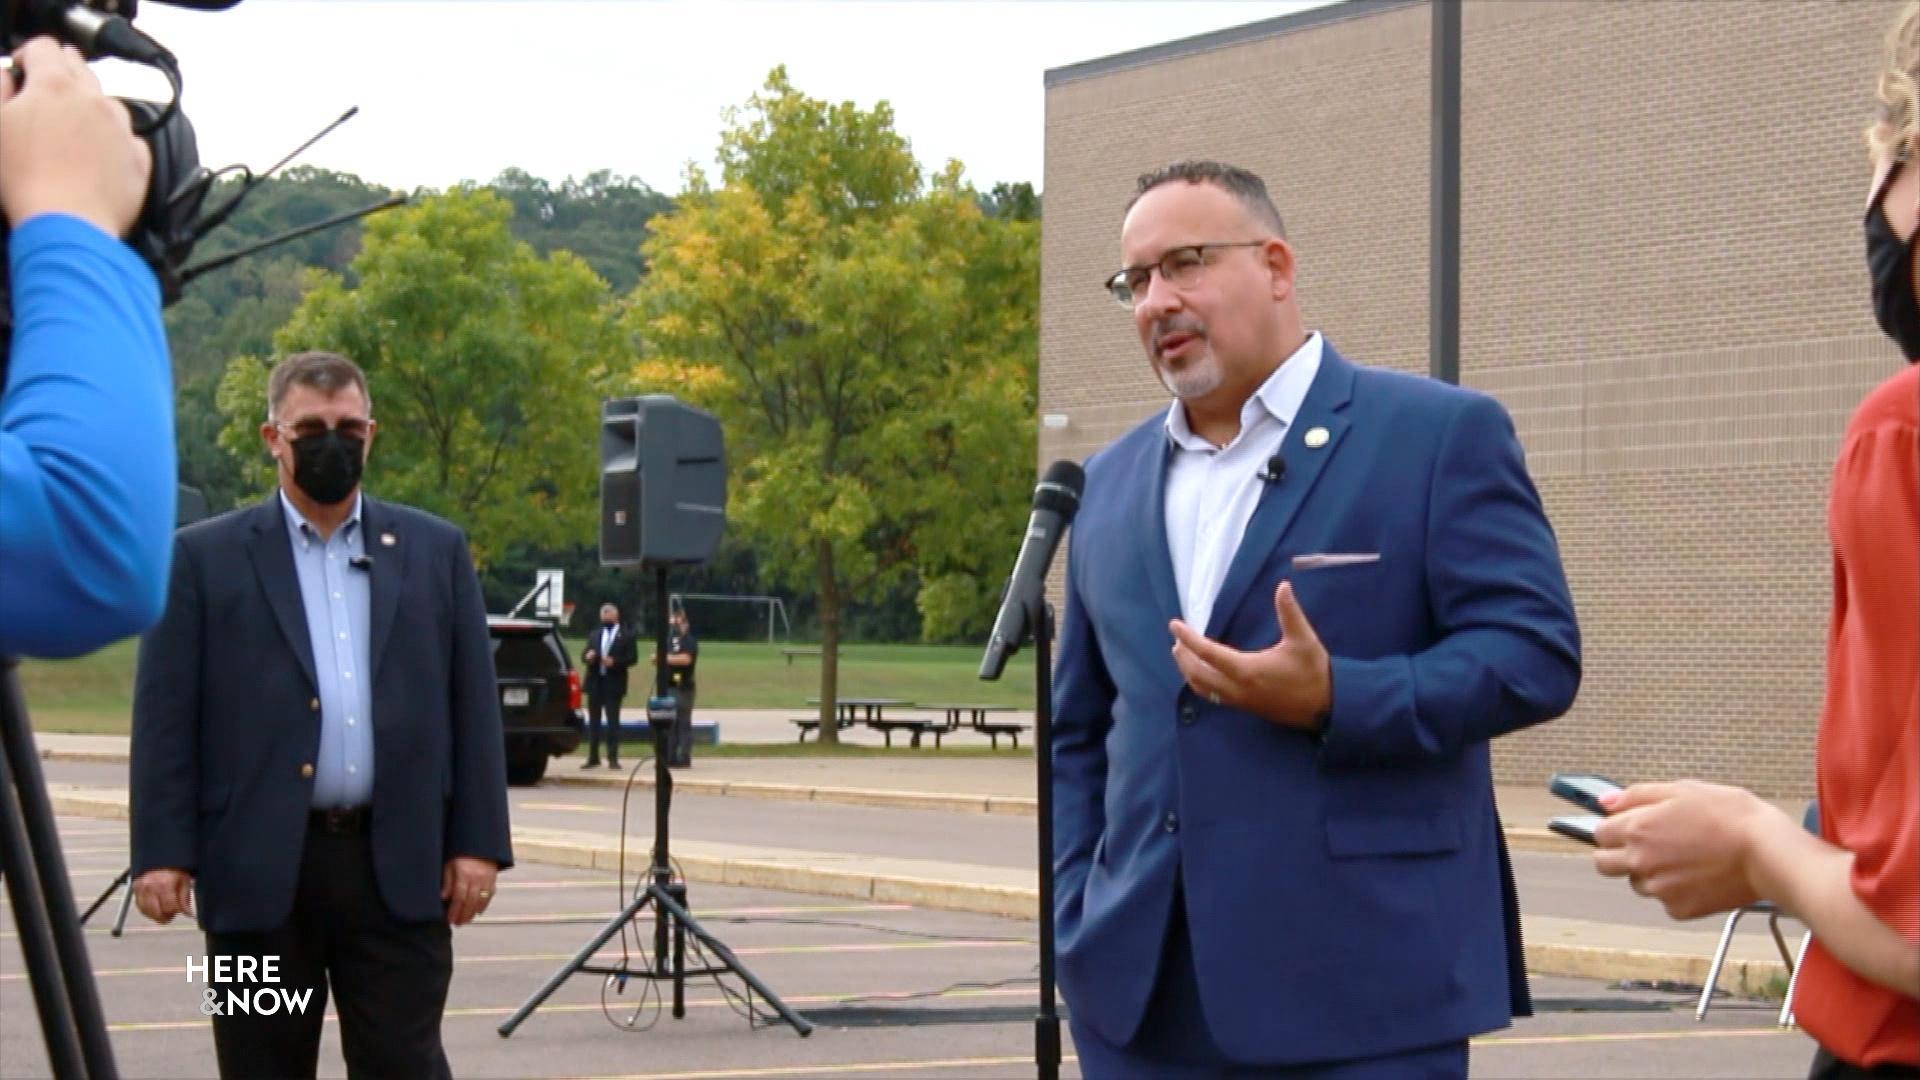 US Secretary of Education Visits Wisconsin